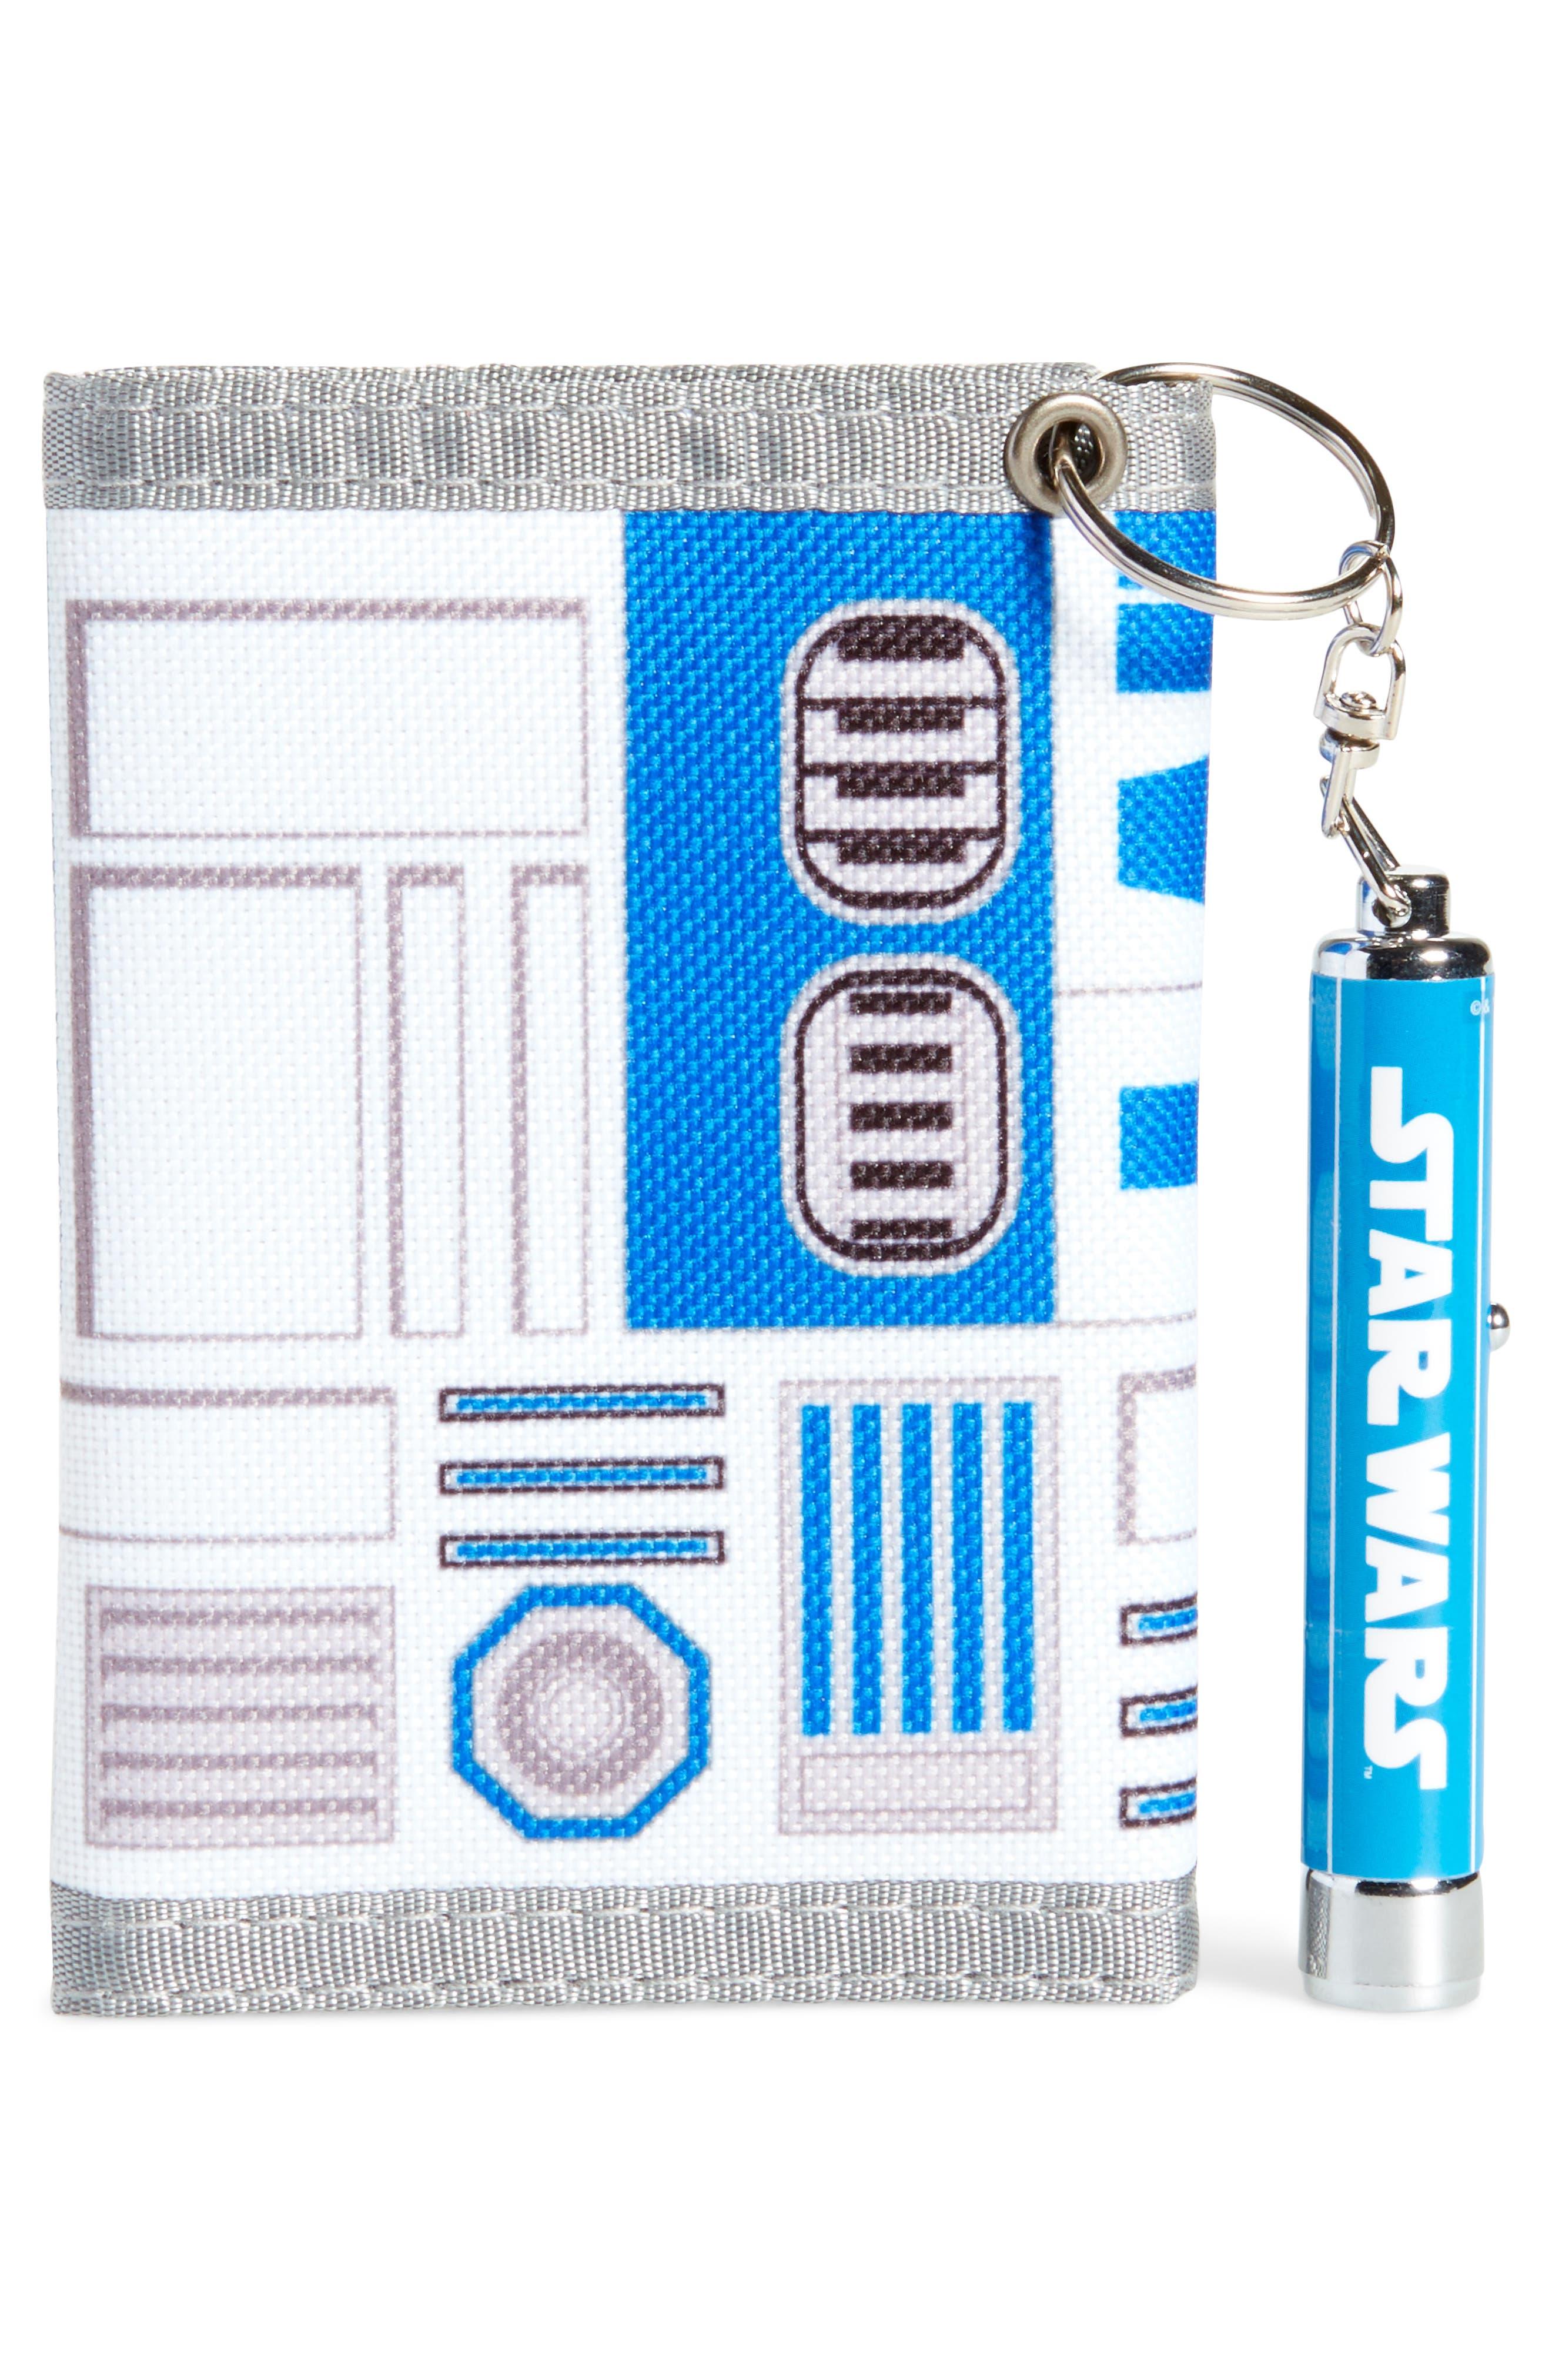 R2-D2 Wallet & Logo Light Key Chain,                             Alternate thumbnail 2, color,                             100